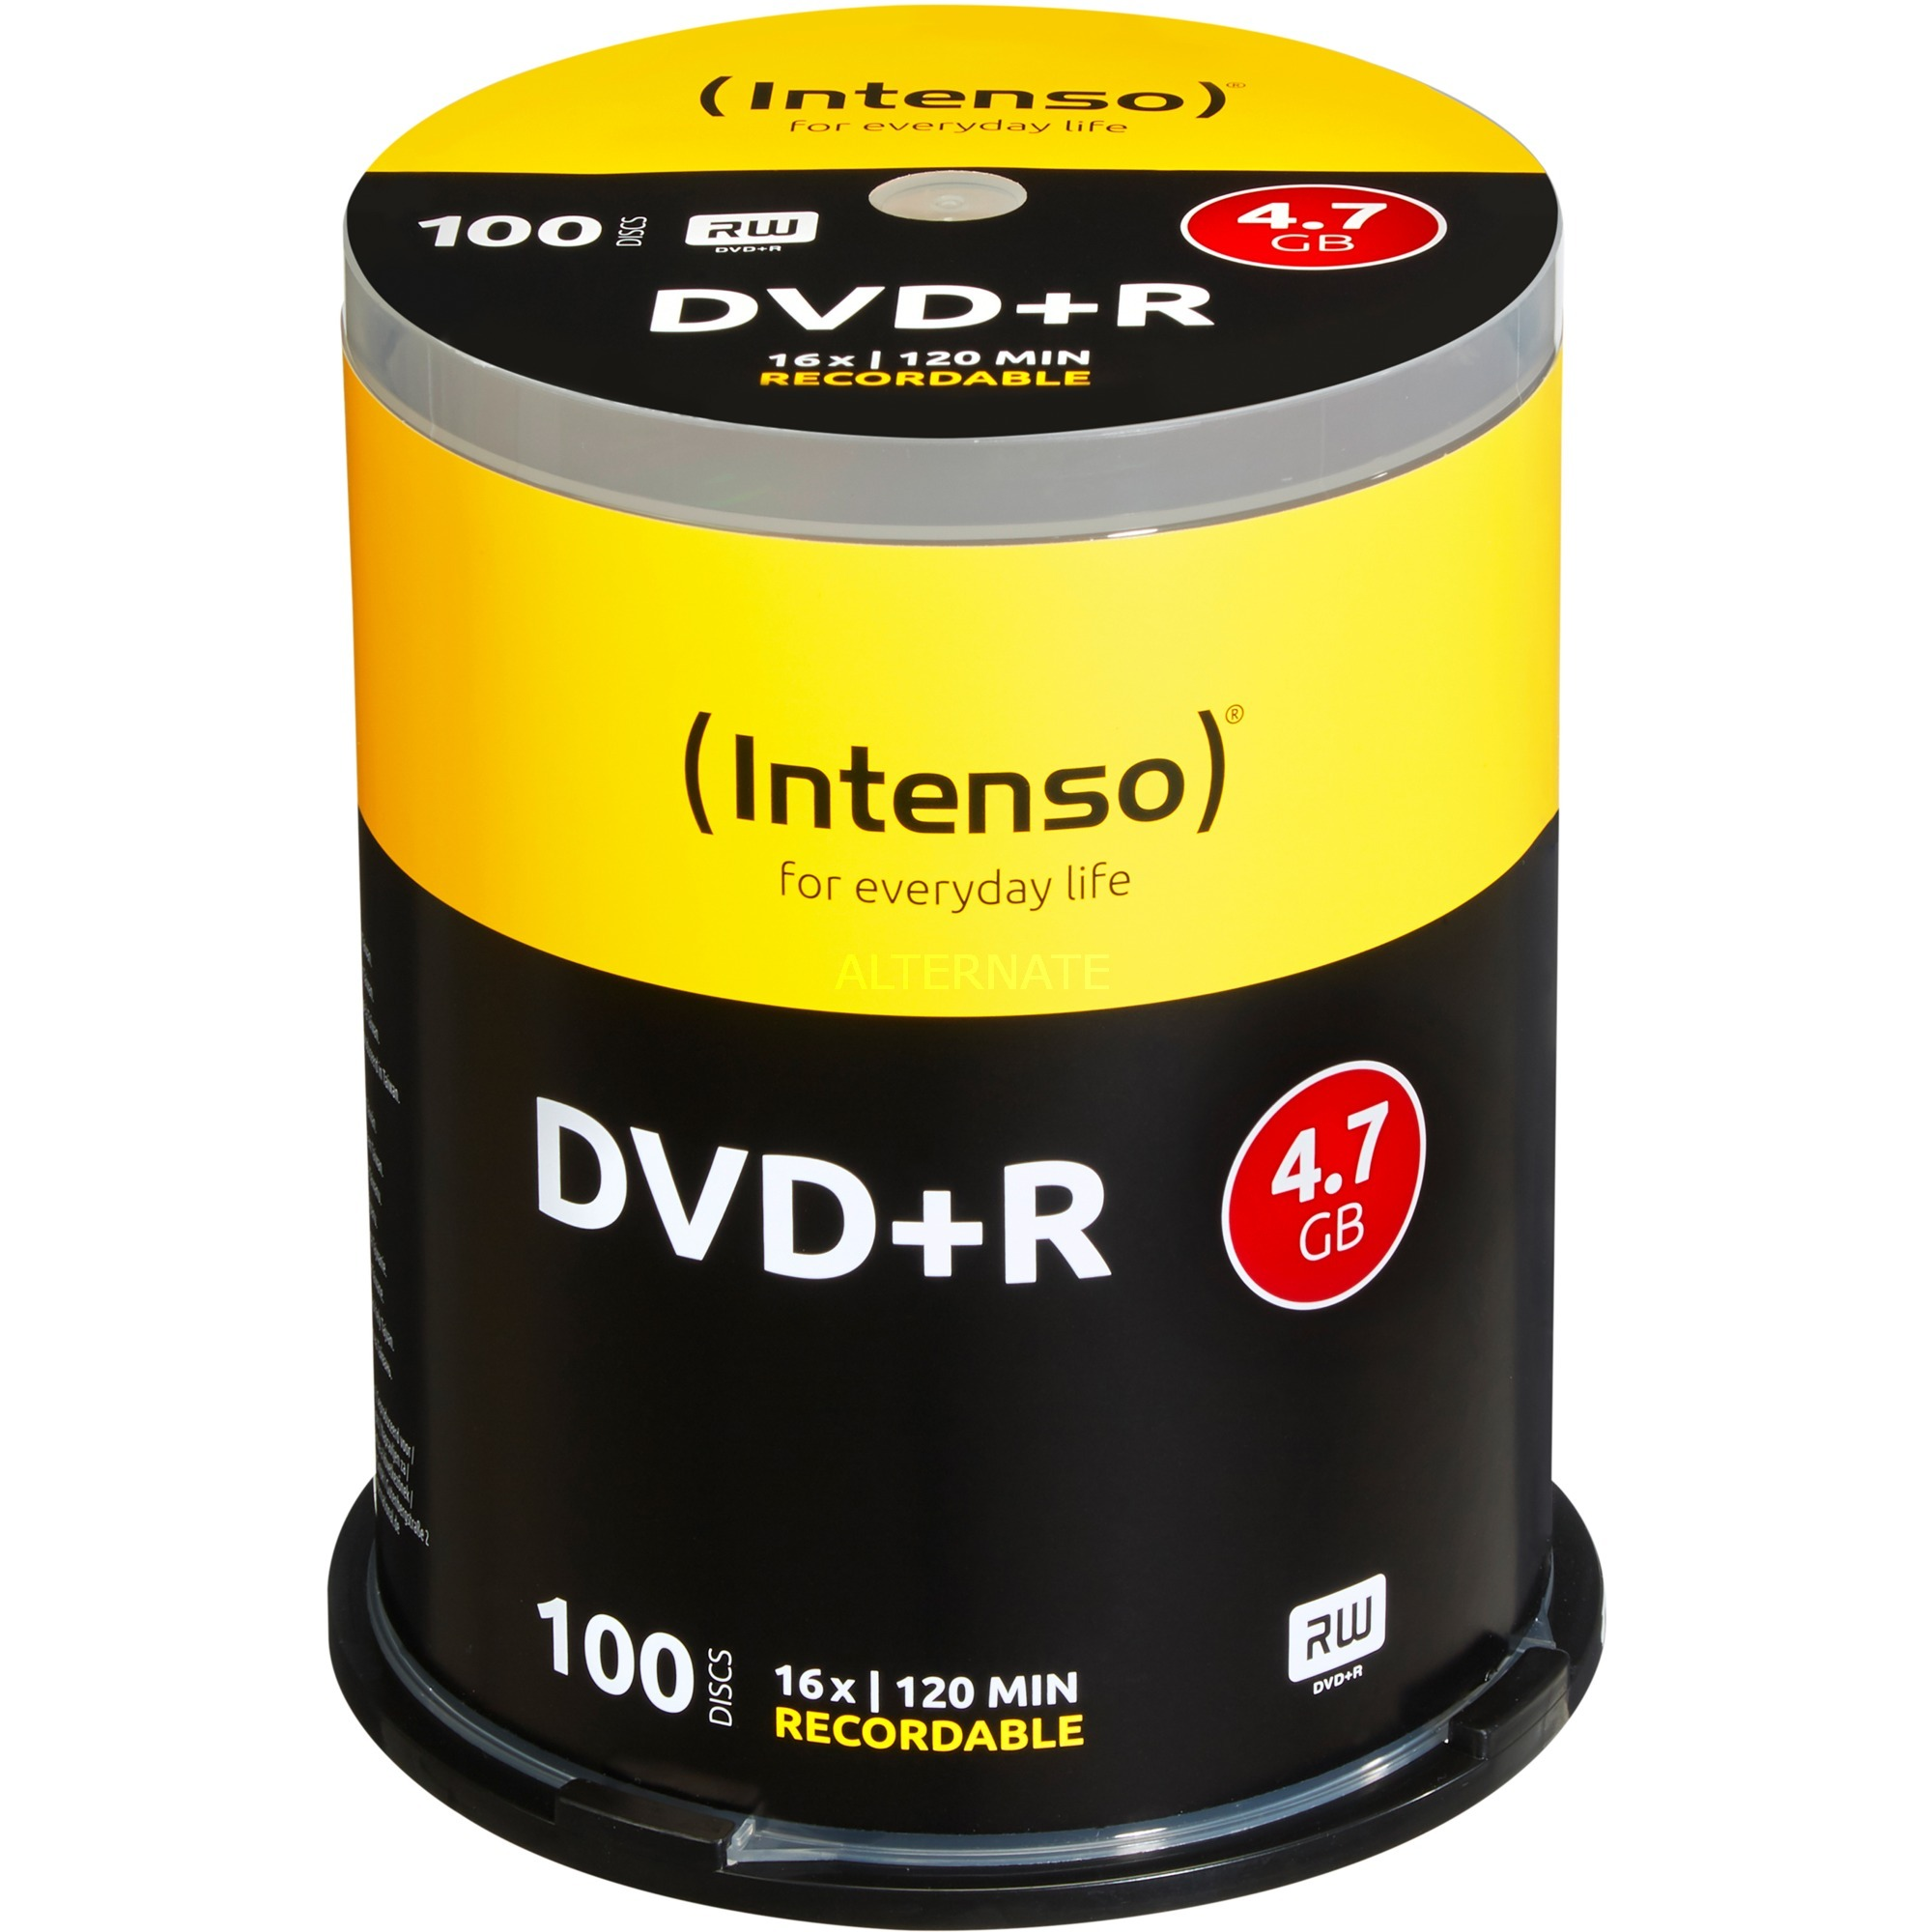 DVD+R 4,7 GB 16x 4.7Go DVD+R 100pièce(s), Support vierge DVD